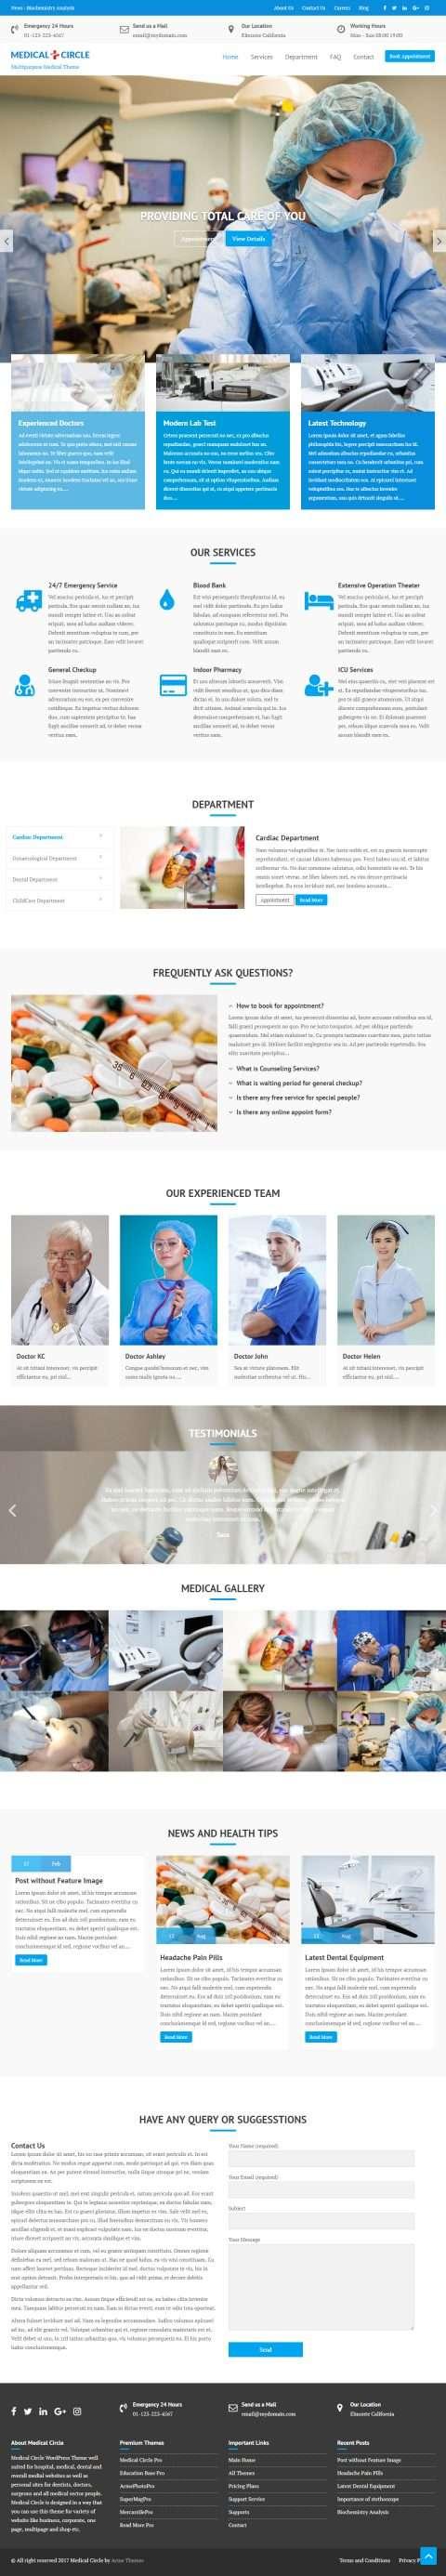 Medical Circle